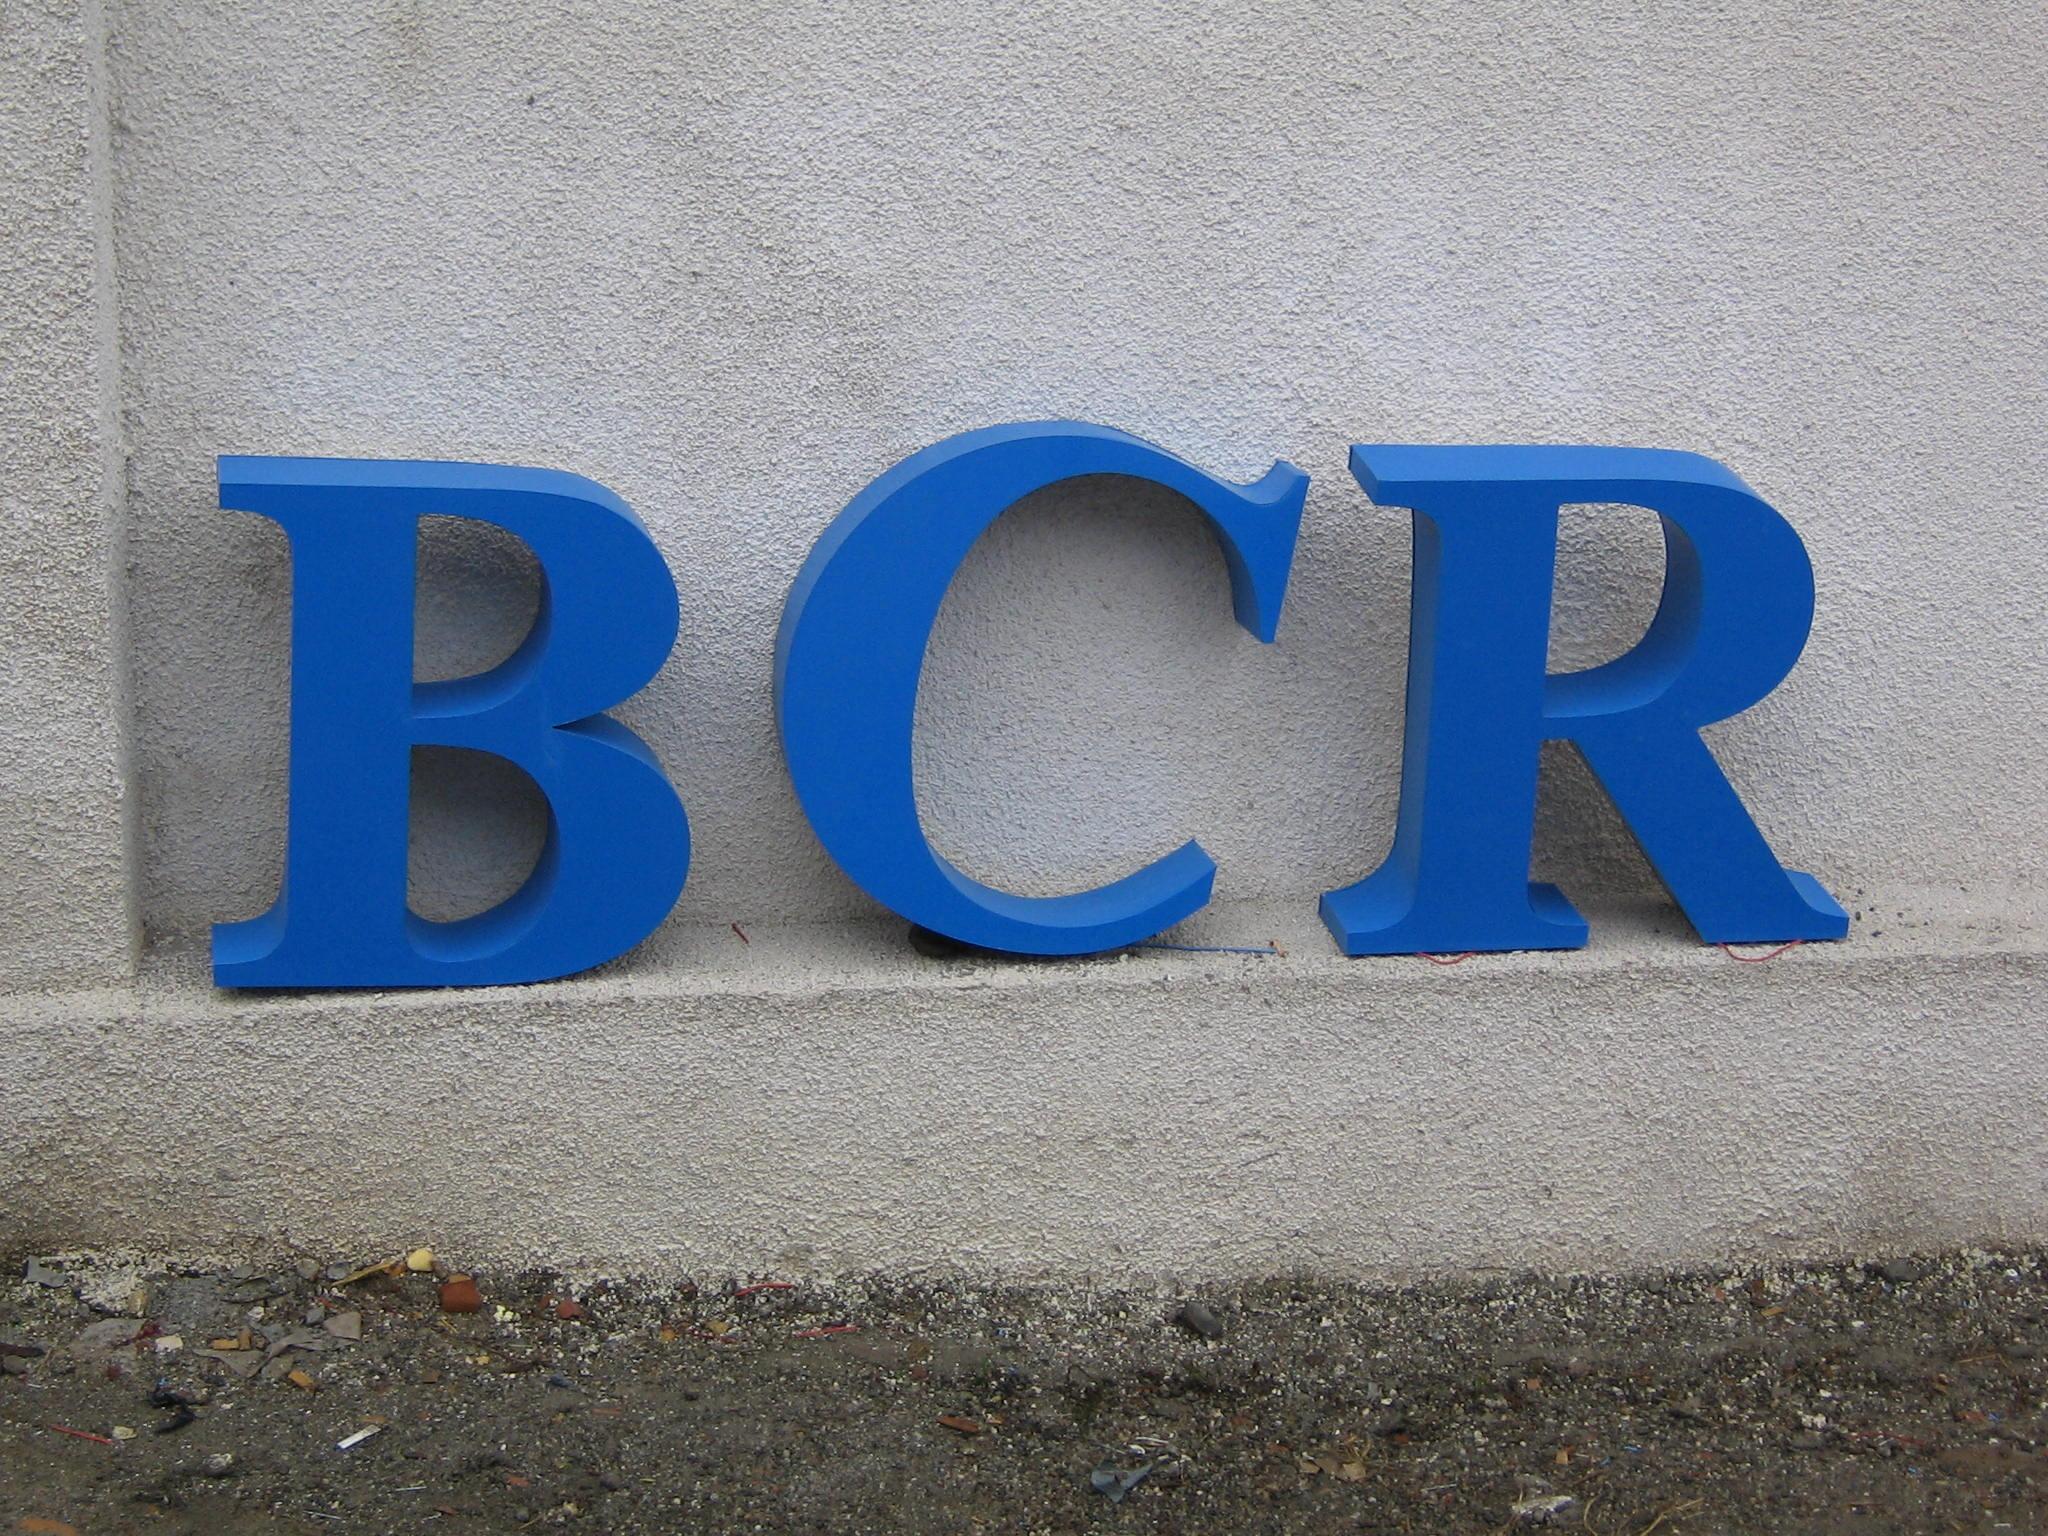 LITERE VOLUMETRICE LUMINOASE BCR